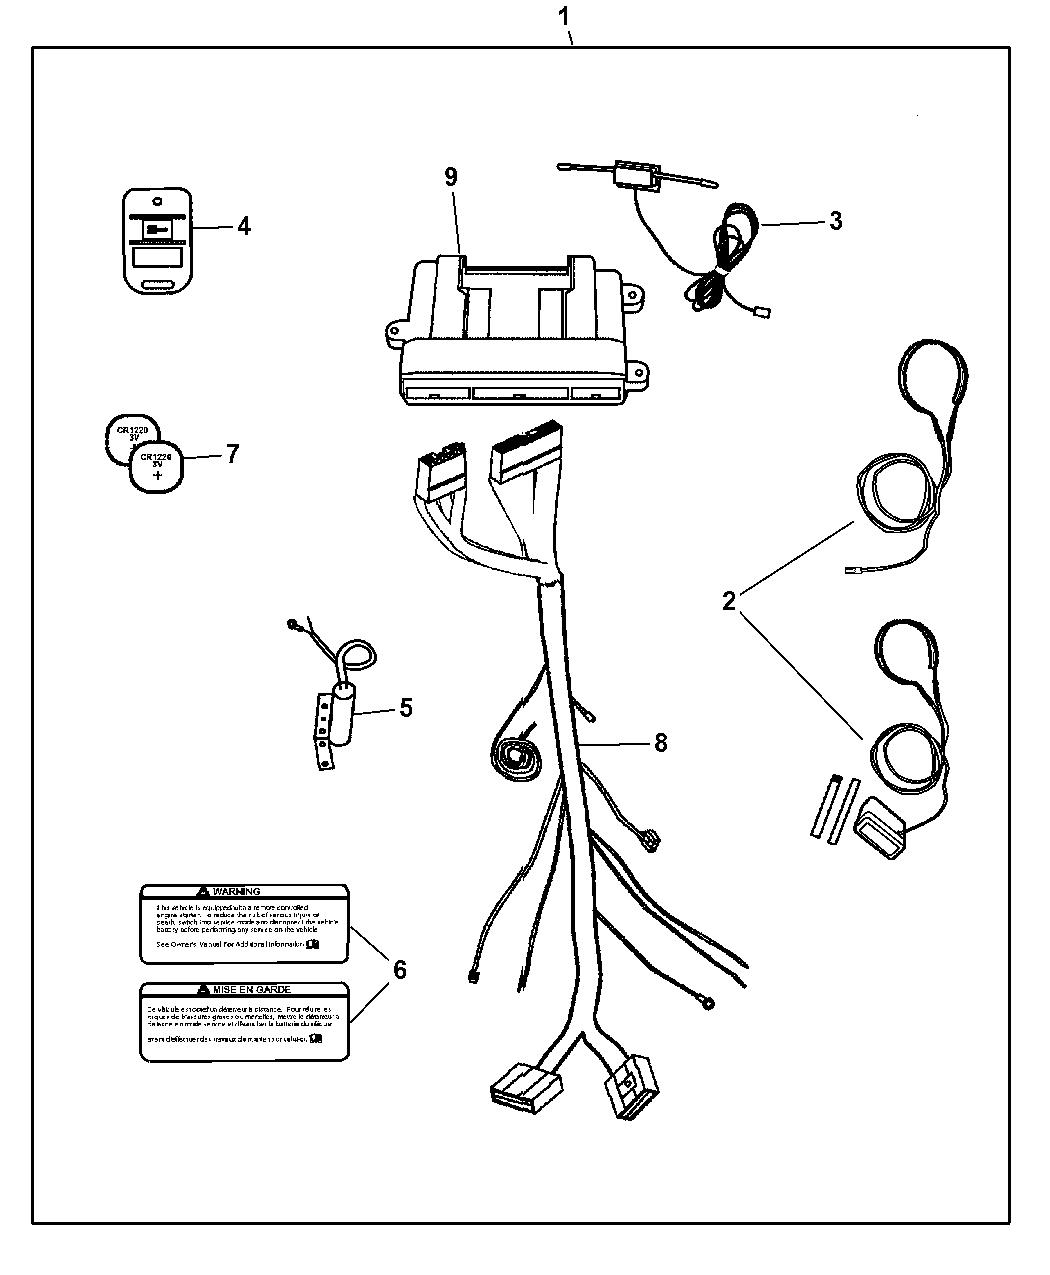 2006 Dodge Dakota Remote Start - Installation Kit